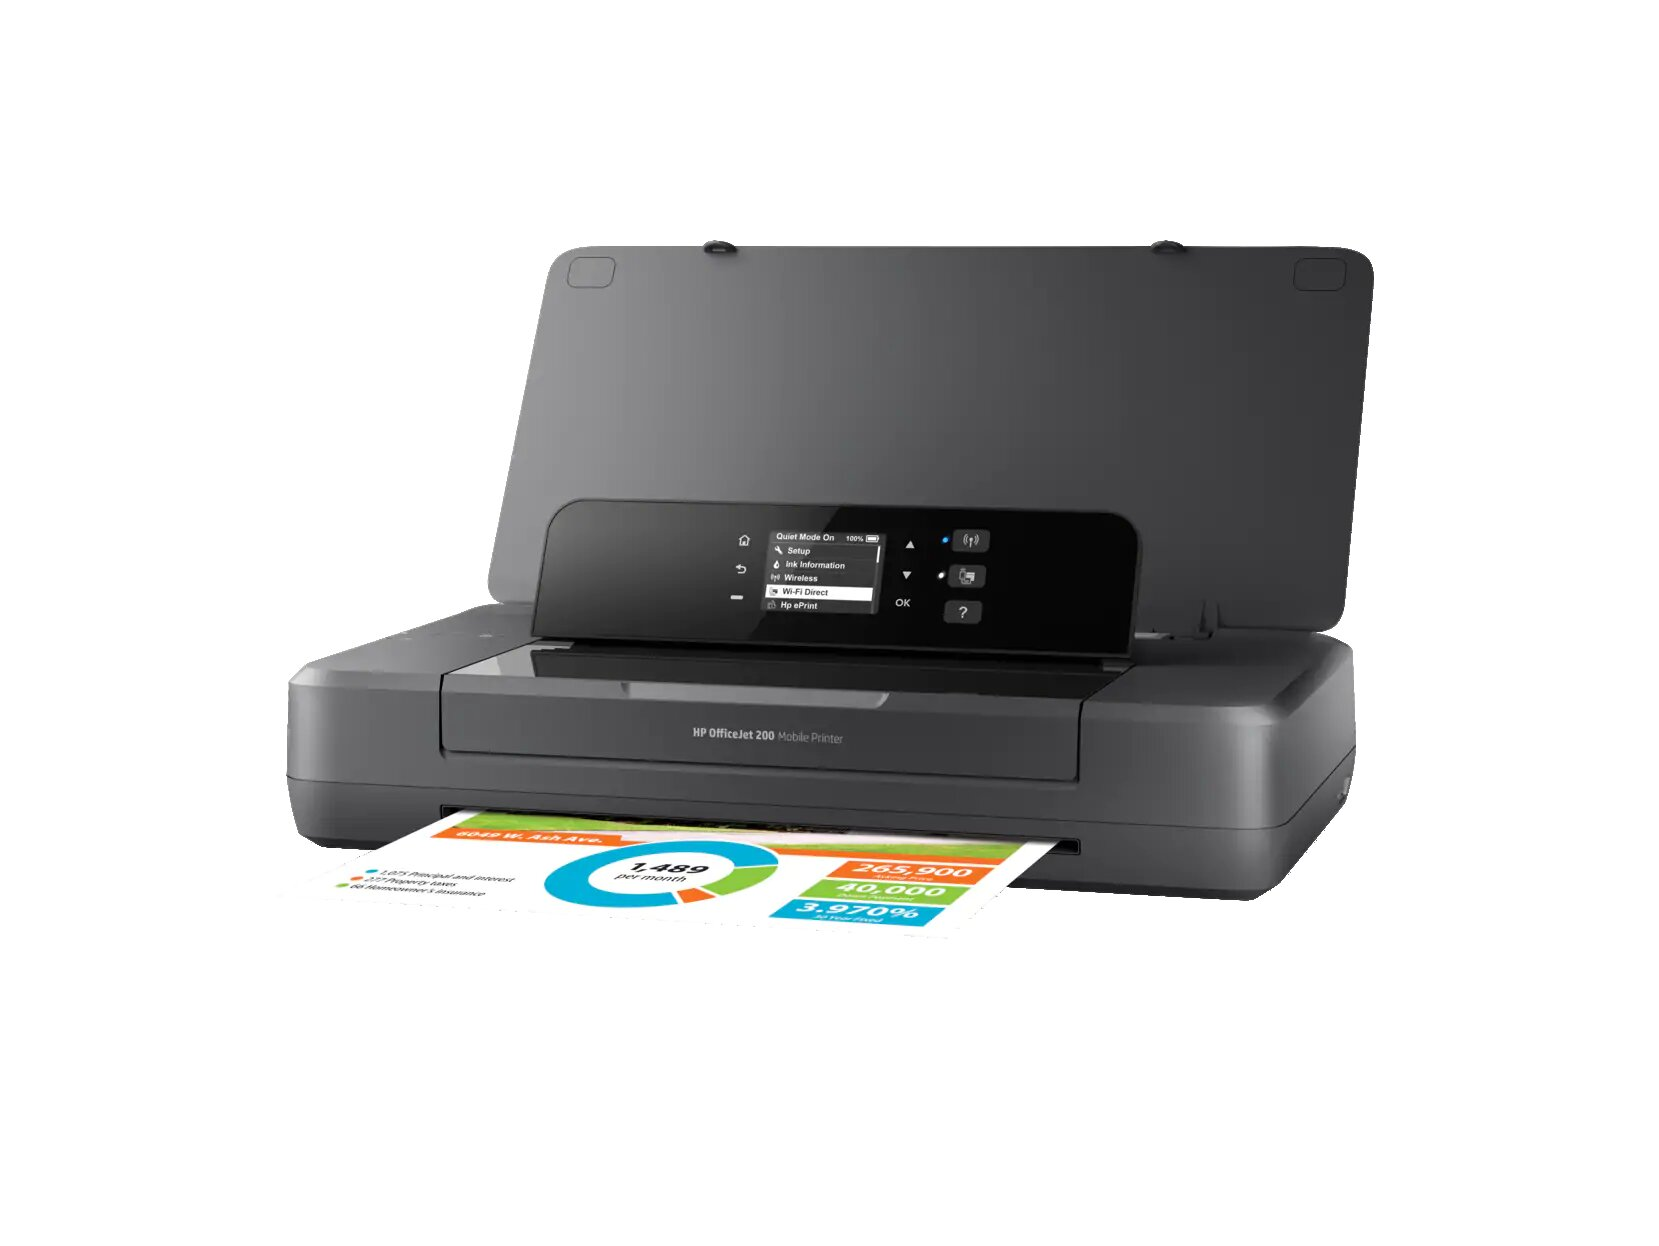 HP OfficeJet 200 Mobile Printer - Wizz Computers Ltd